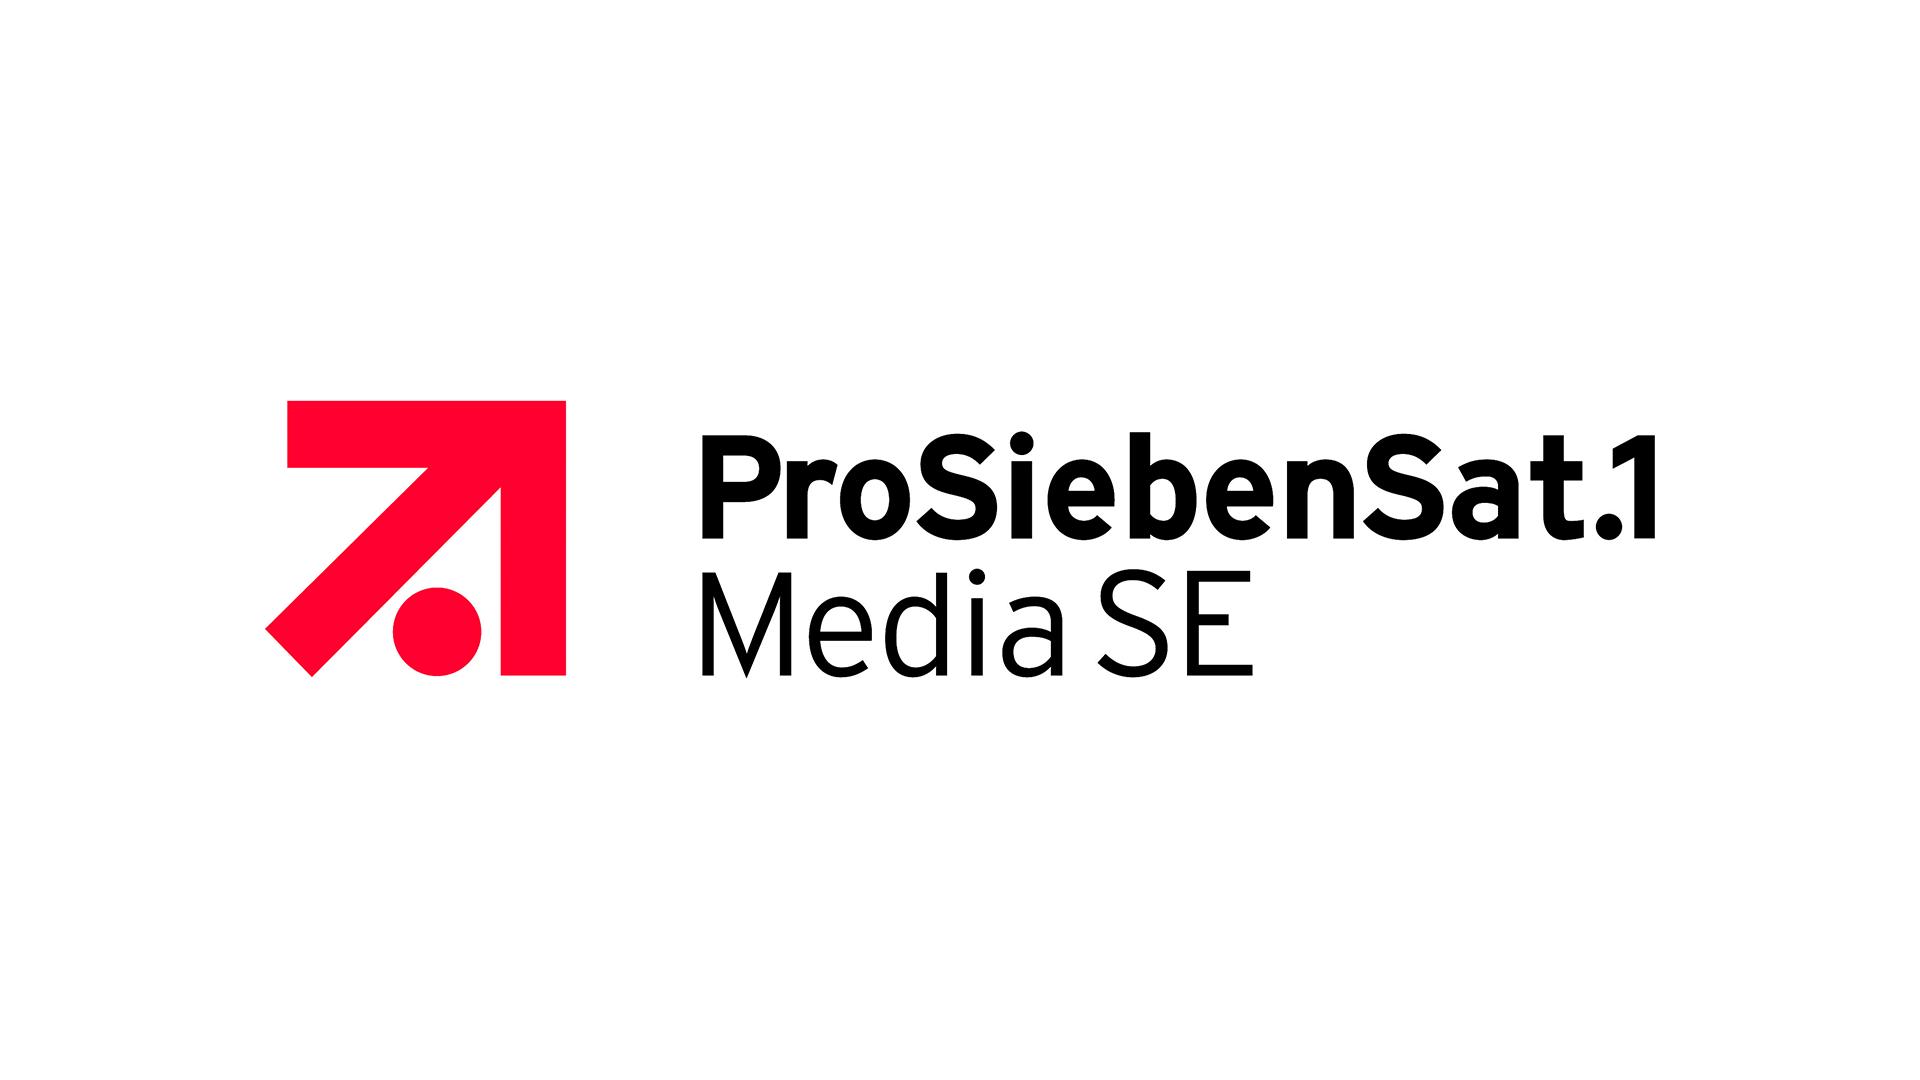 Prosiebensati Media SE